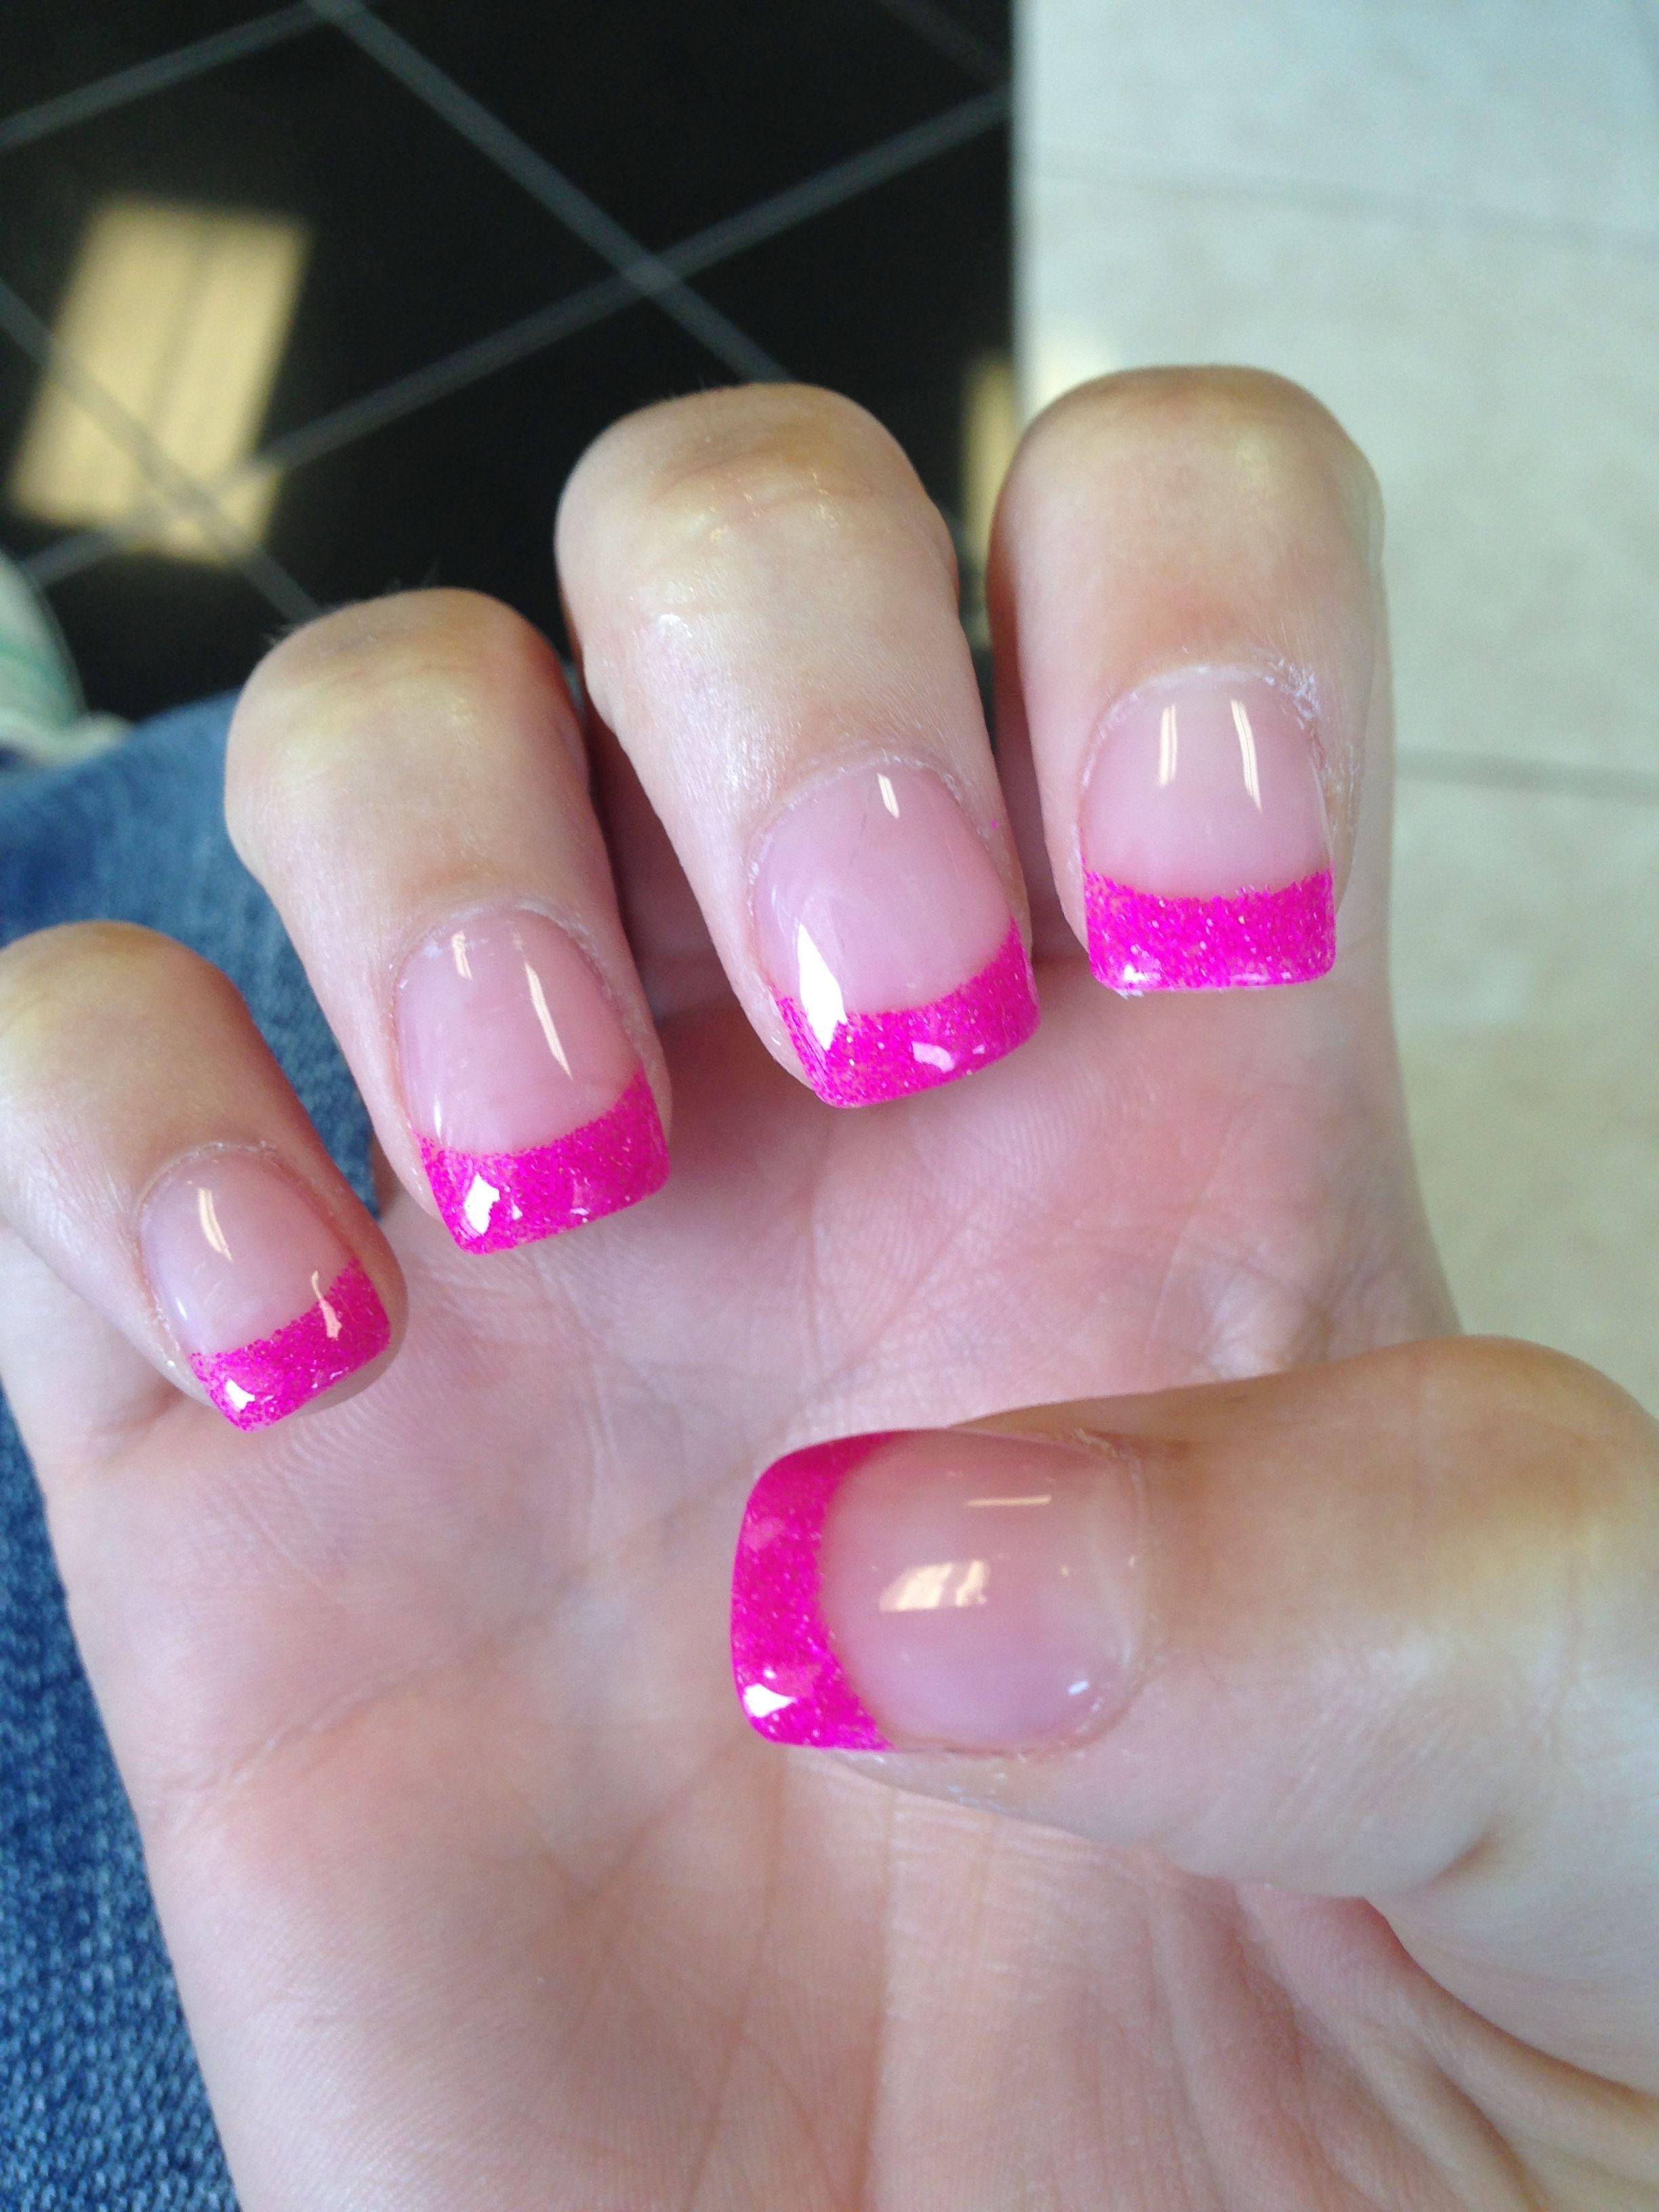 Pin By Tifani Thomas On Lovely Nails Pink French Manicure Pink Tip Nails Glitter French Manicure